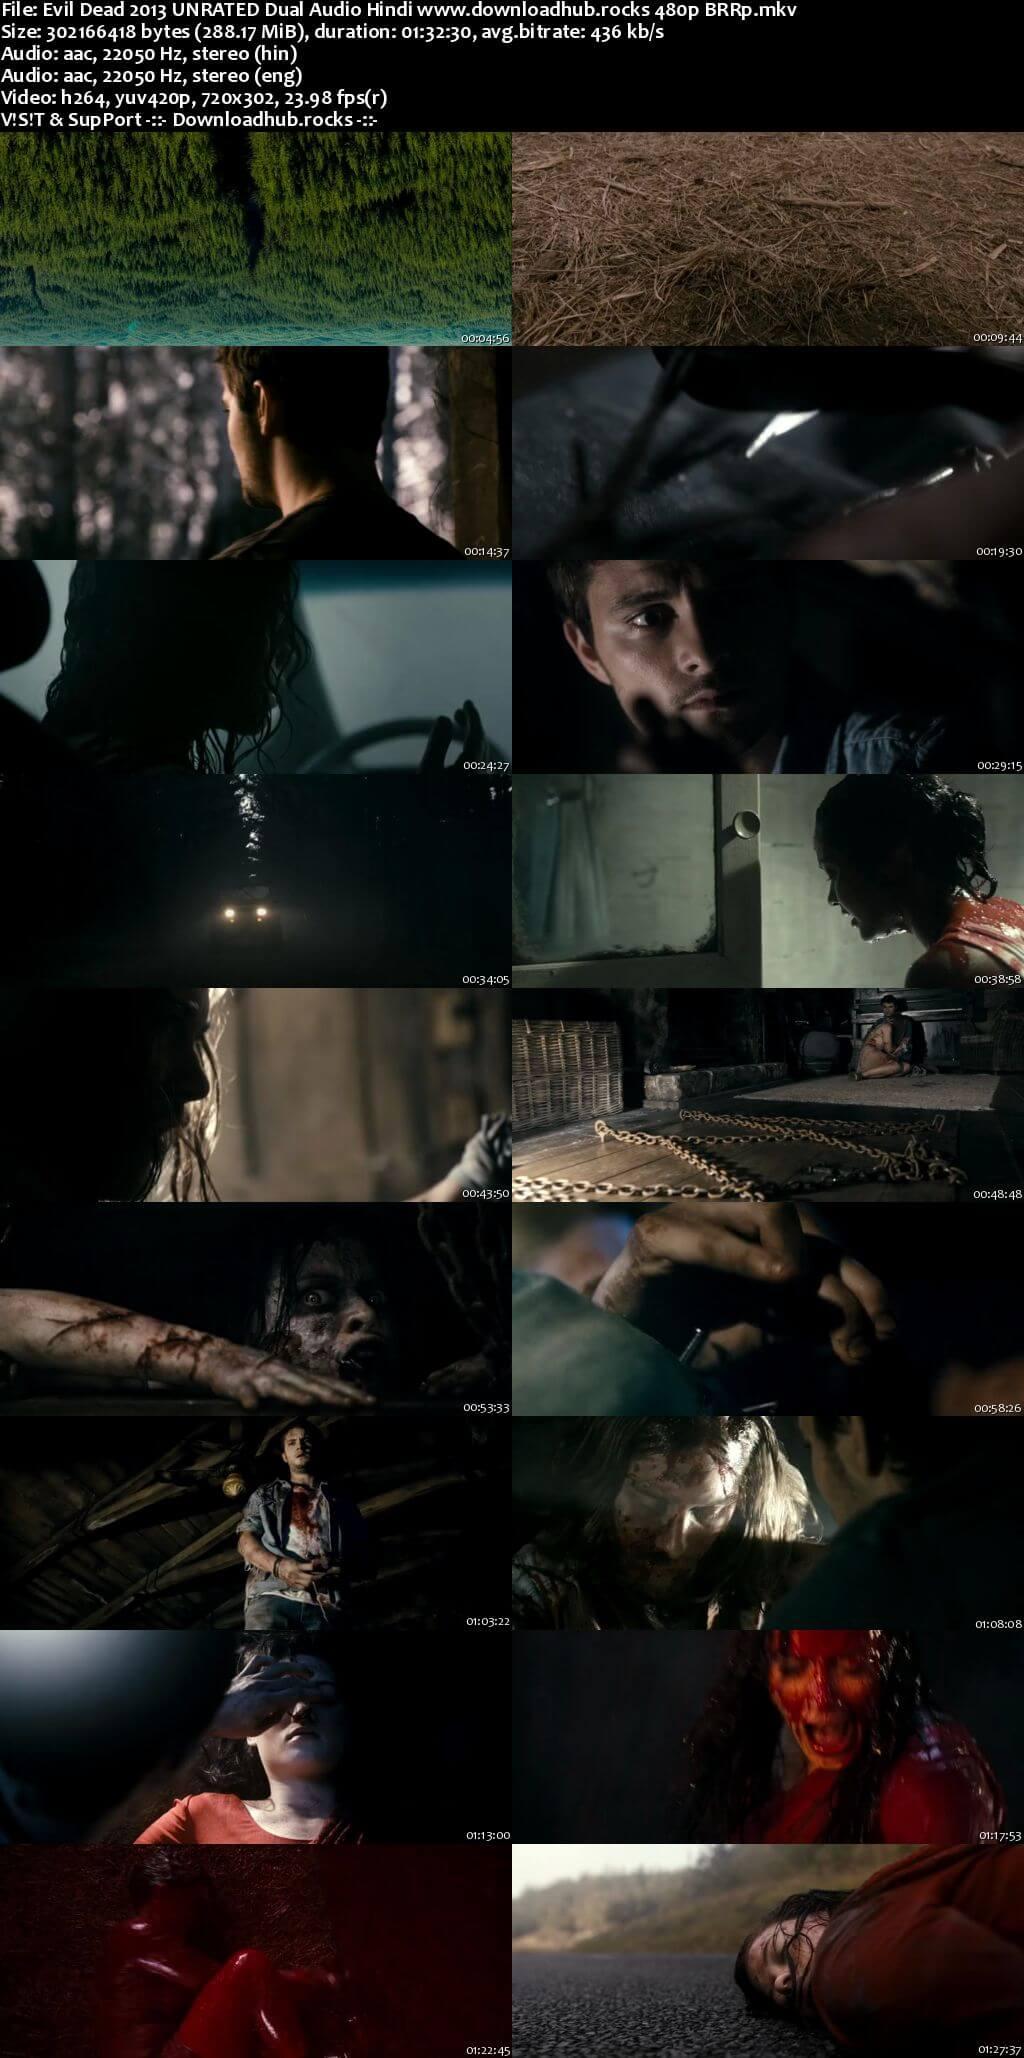 Evil Dead 2013 Hindi Dual Audio 280MB BluRay 480p